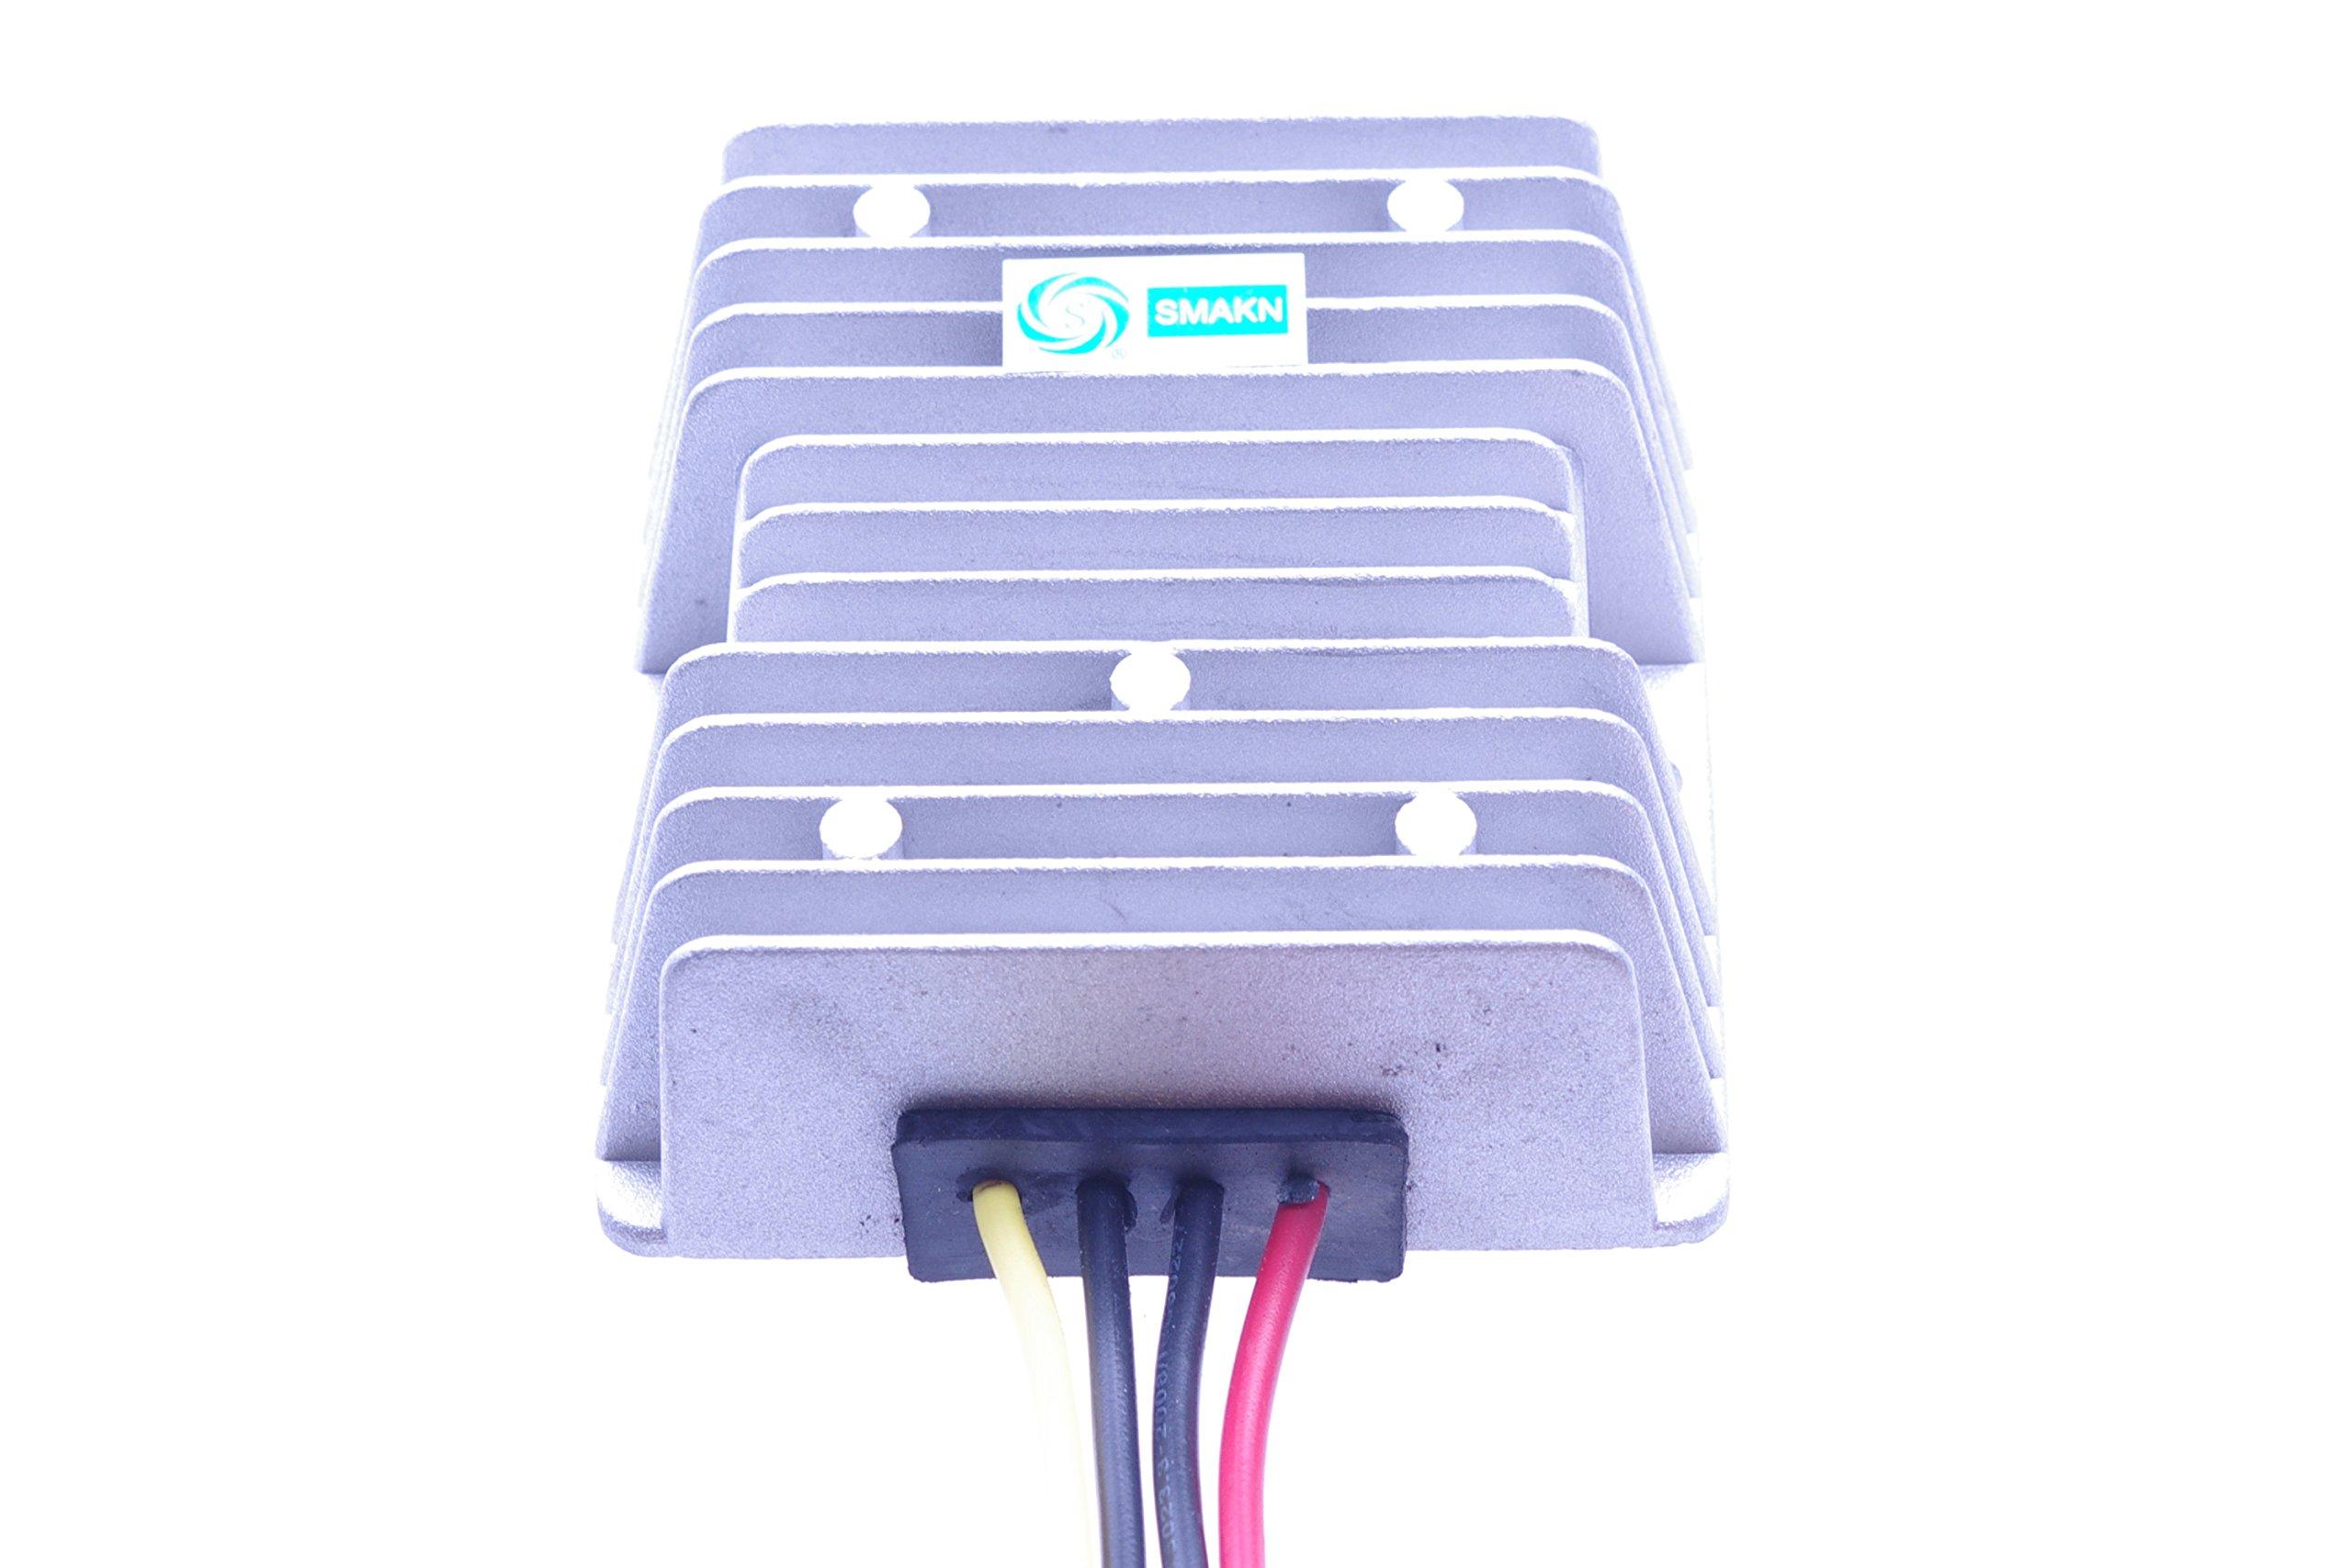 SMAKN DC/DC Converter 48V/36V (30V-60V) Step Down to 12V/15A 180W Power Supply Module